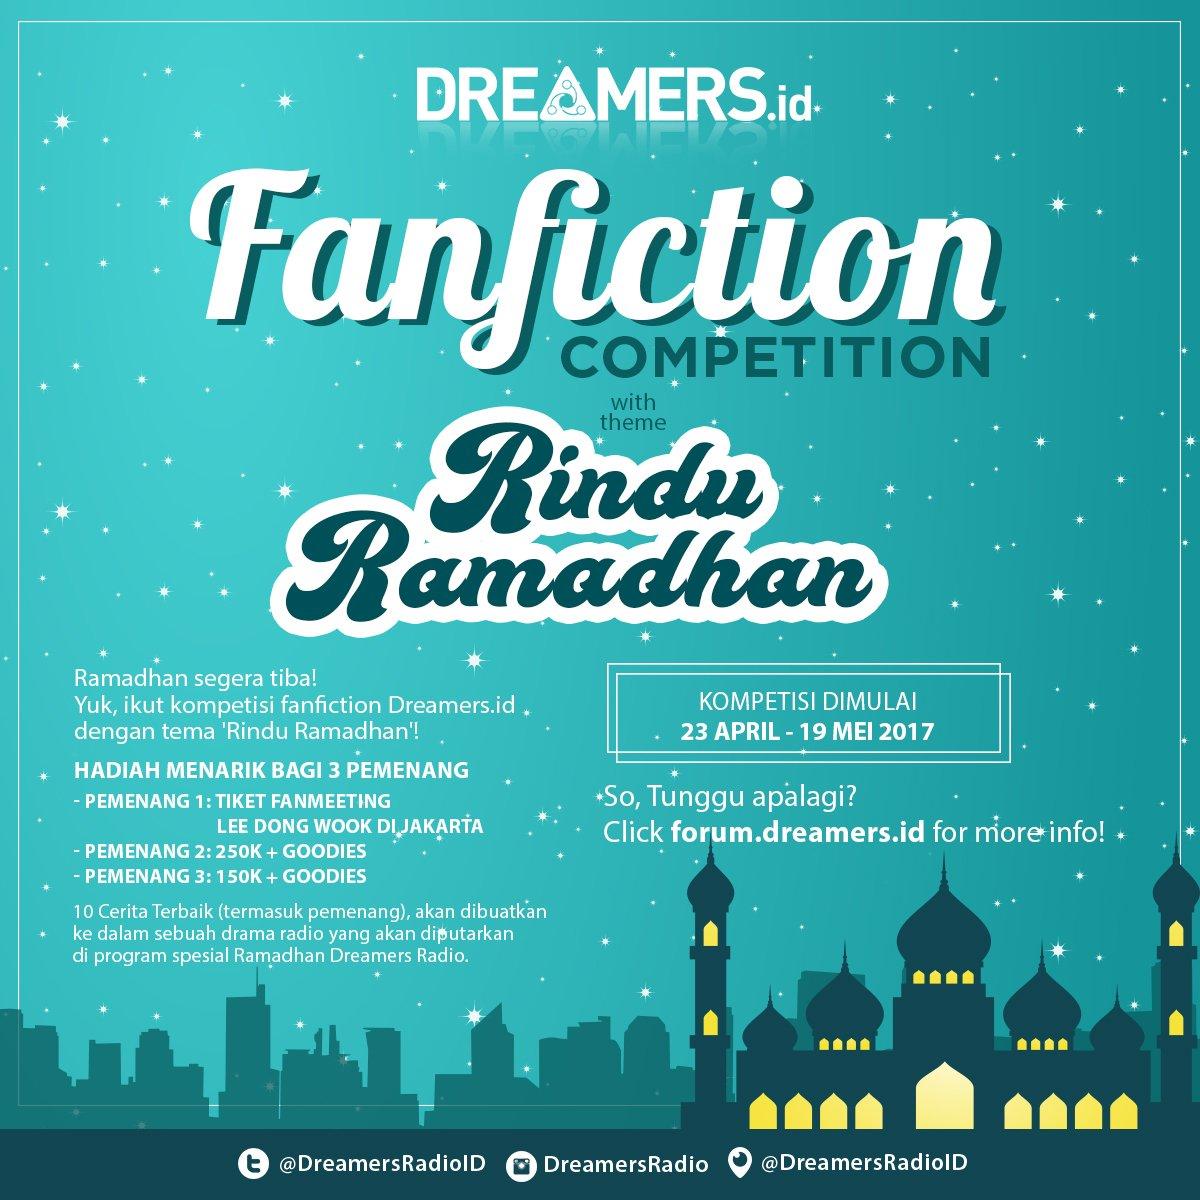 [DreamersxLeeDongWook] Kompetisi Fanfiction Spesial Ramadhan